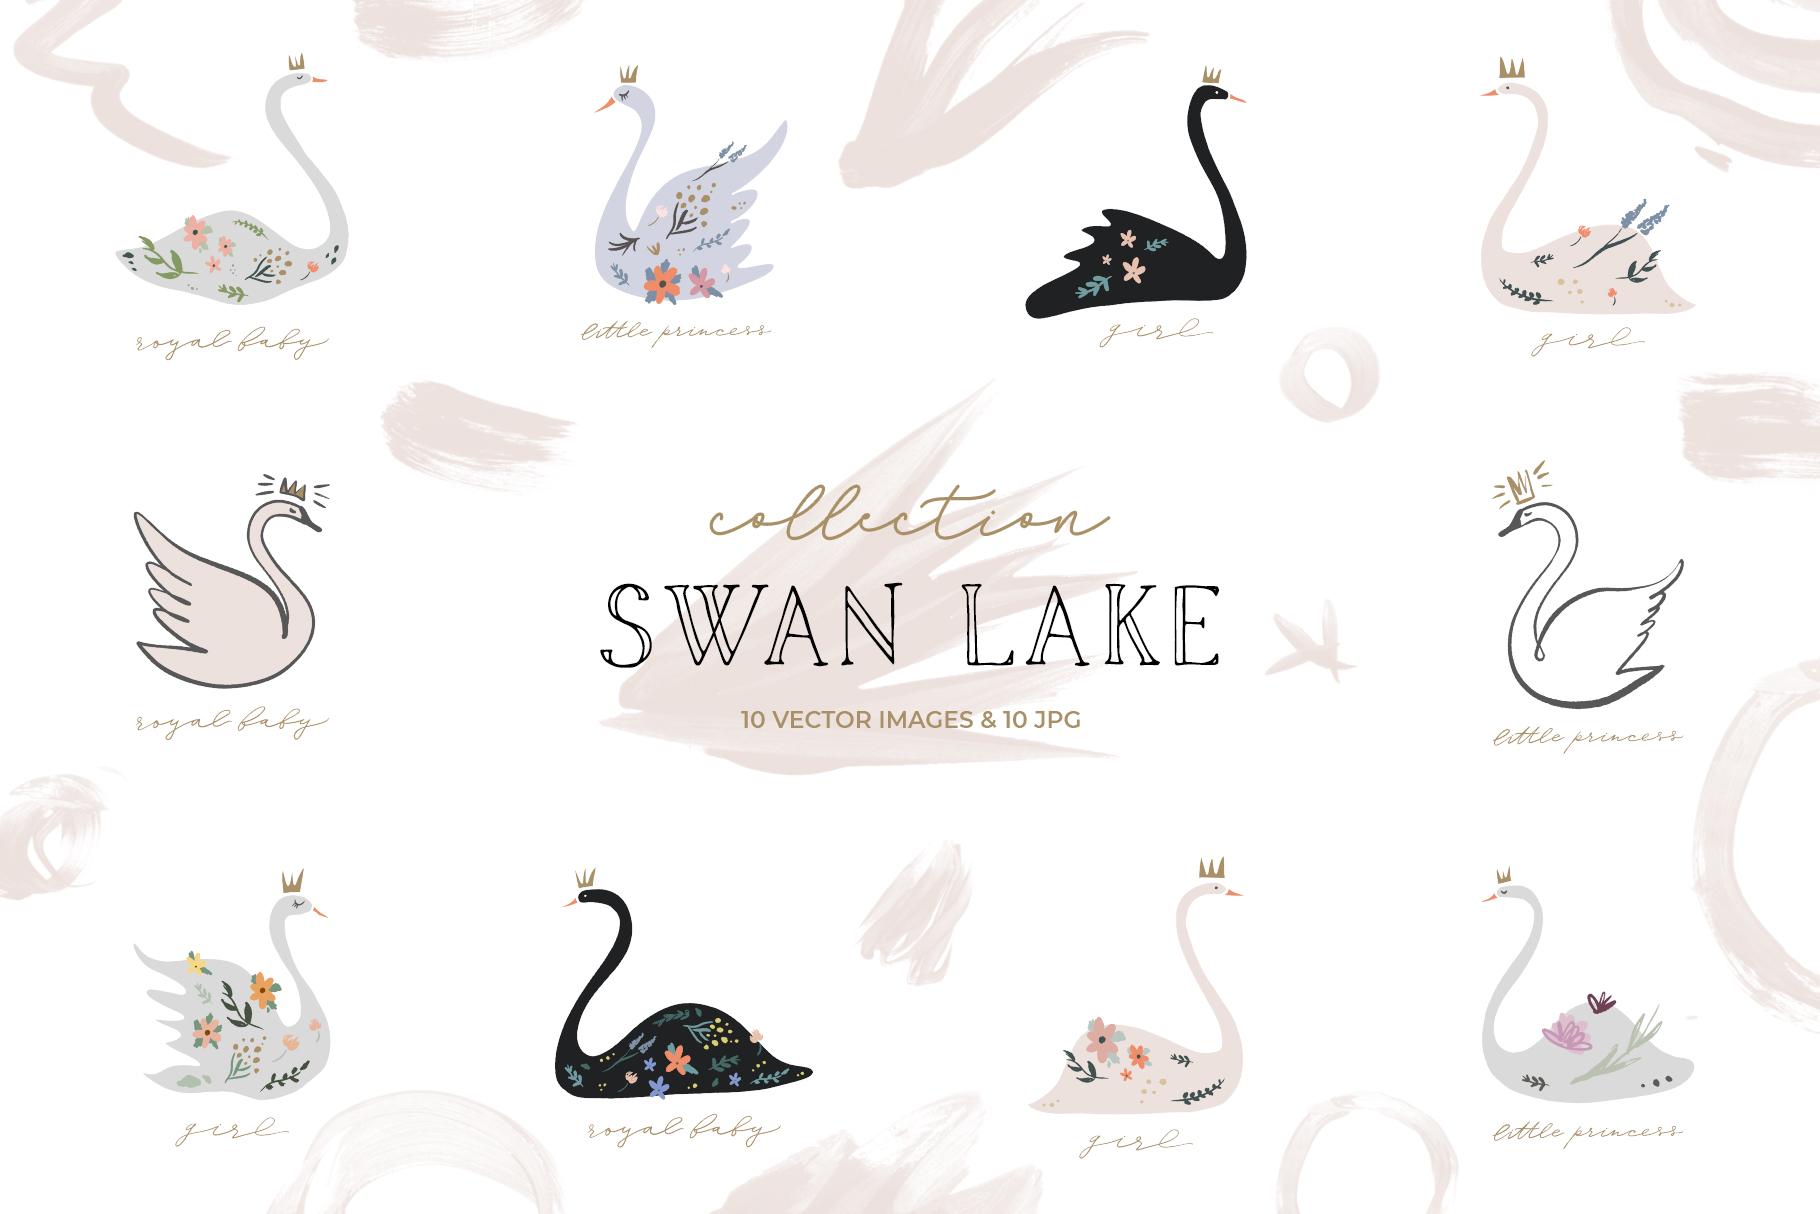 Swan lake wedding clip art set, vector graphics example image 1